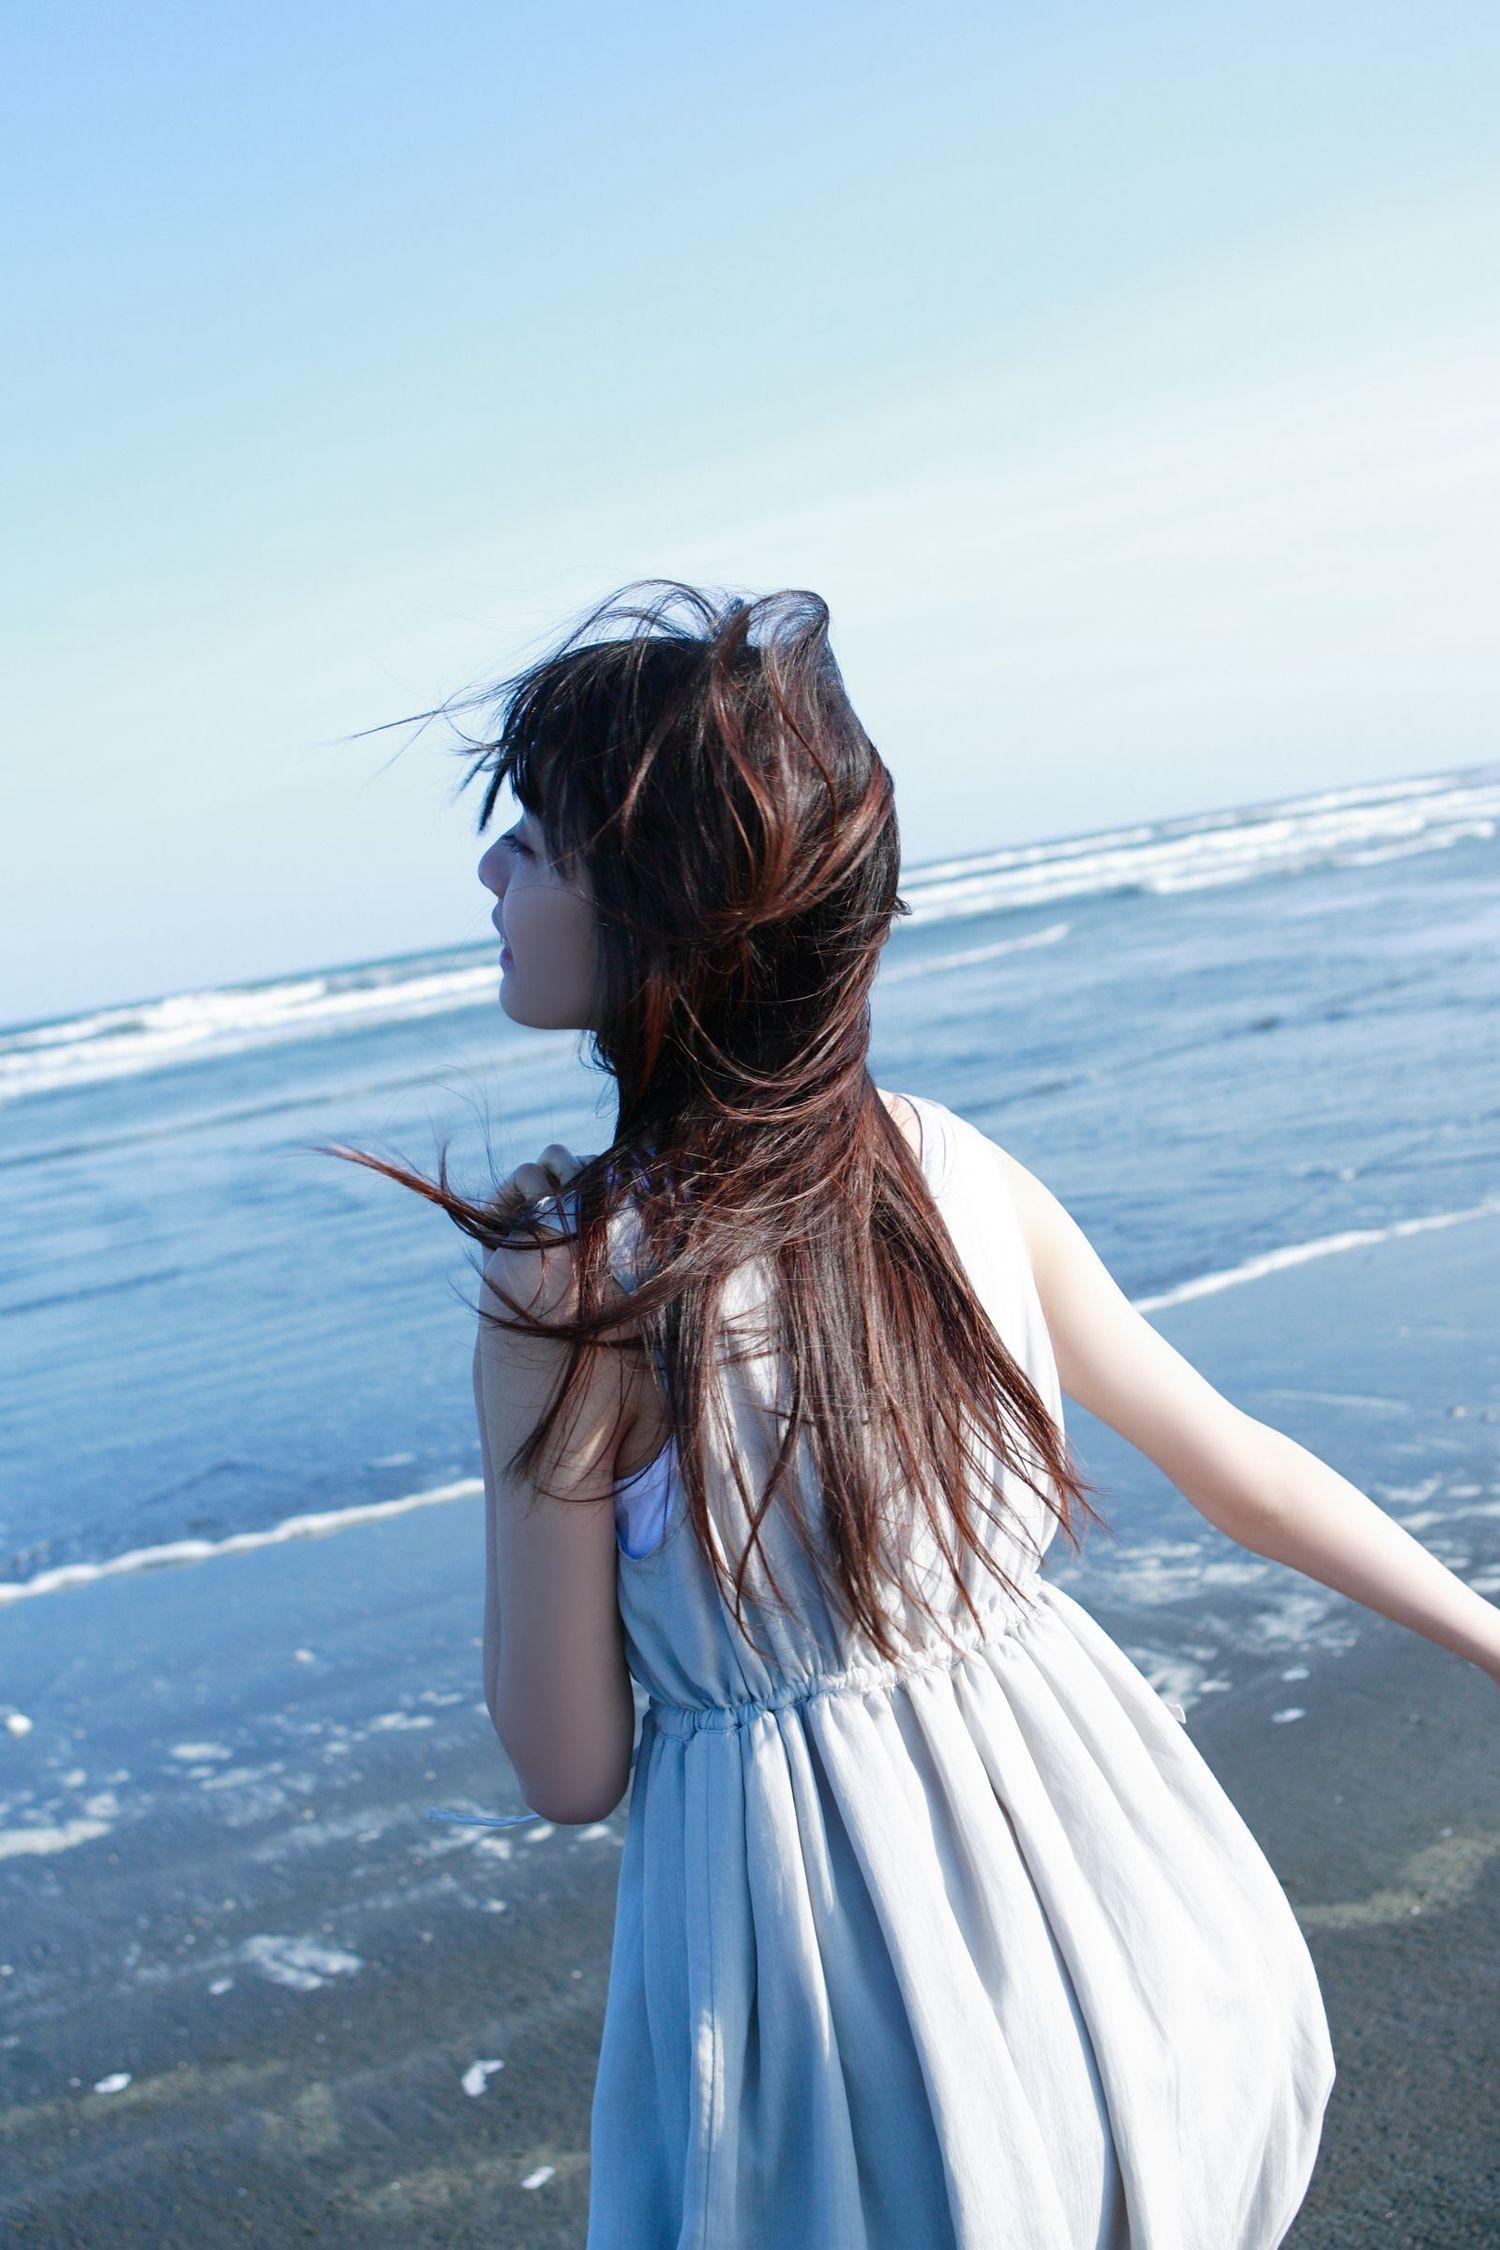 [NS Eyes] SF-No.449 Erika Toda 戸田恵梨香/户田惠梨香 写真集1